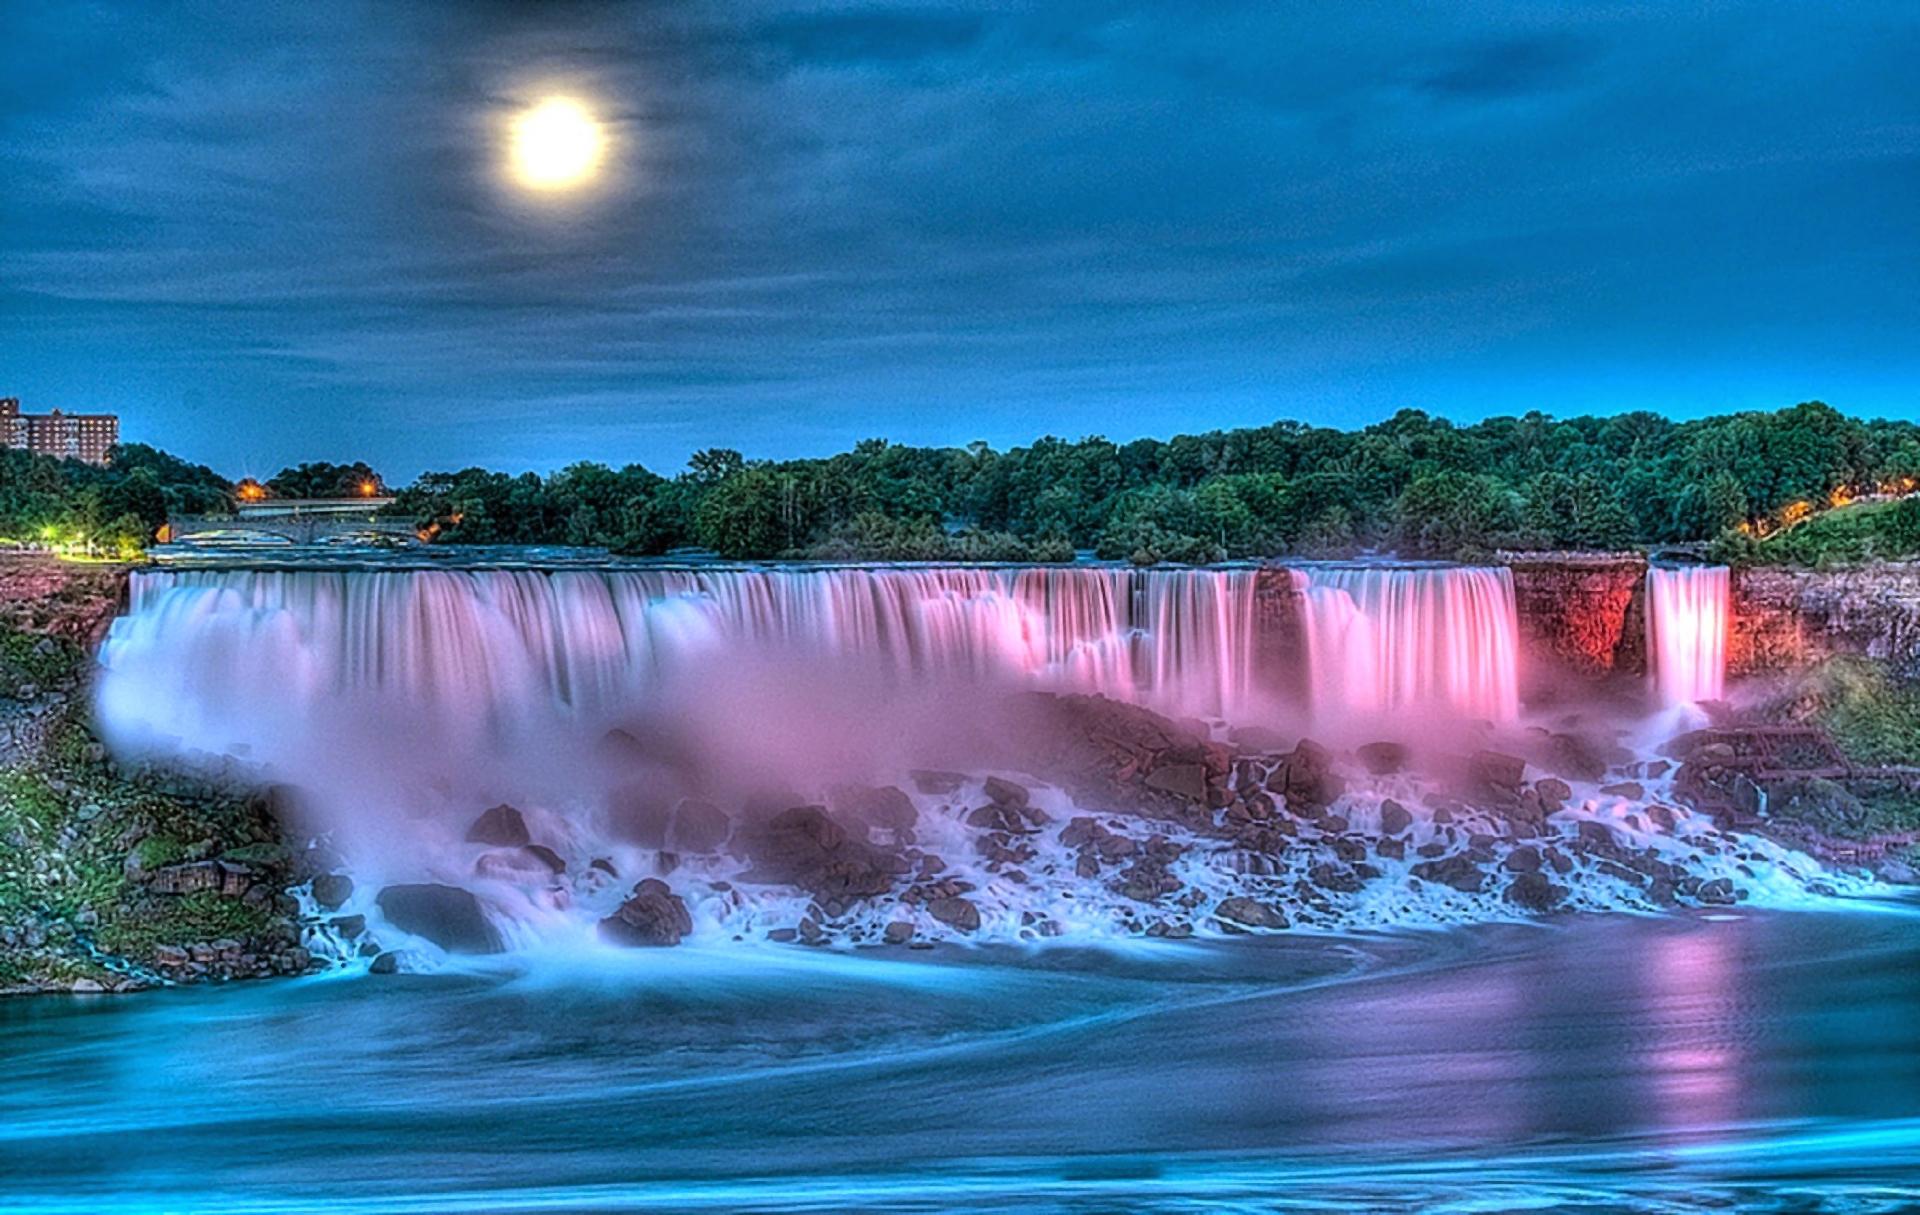 Niagara Falls At Night Wallpaper Hd Waterfall On Full Moon Night Hd Wallpaper Background